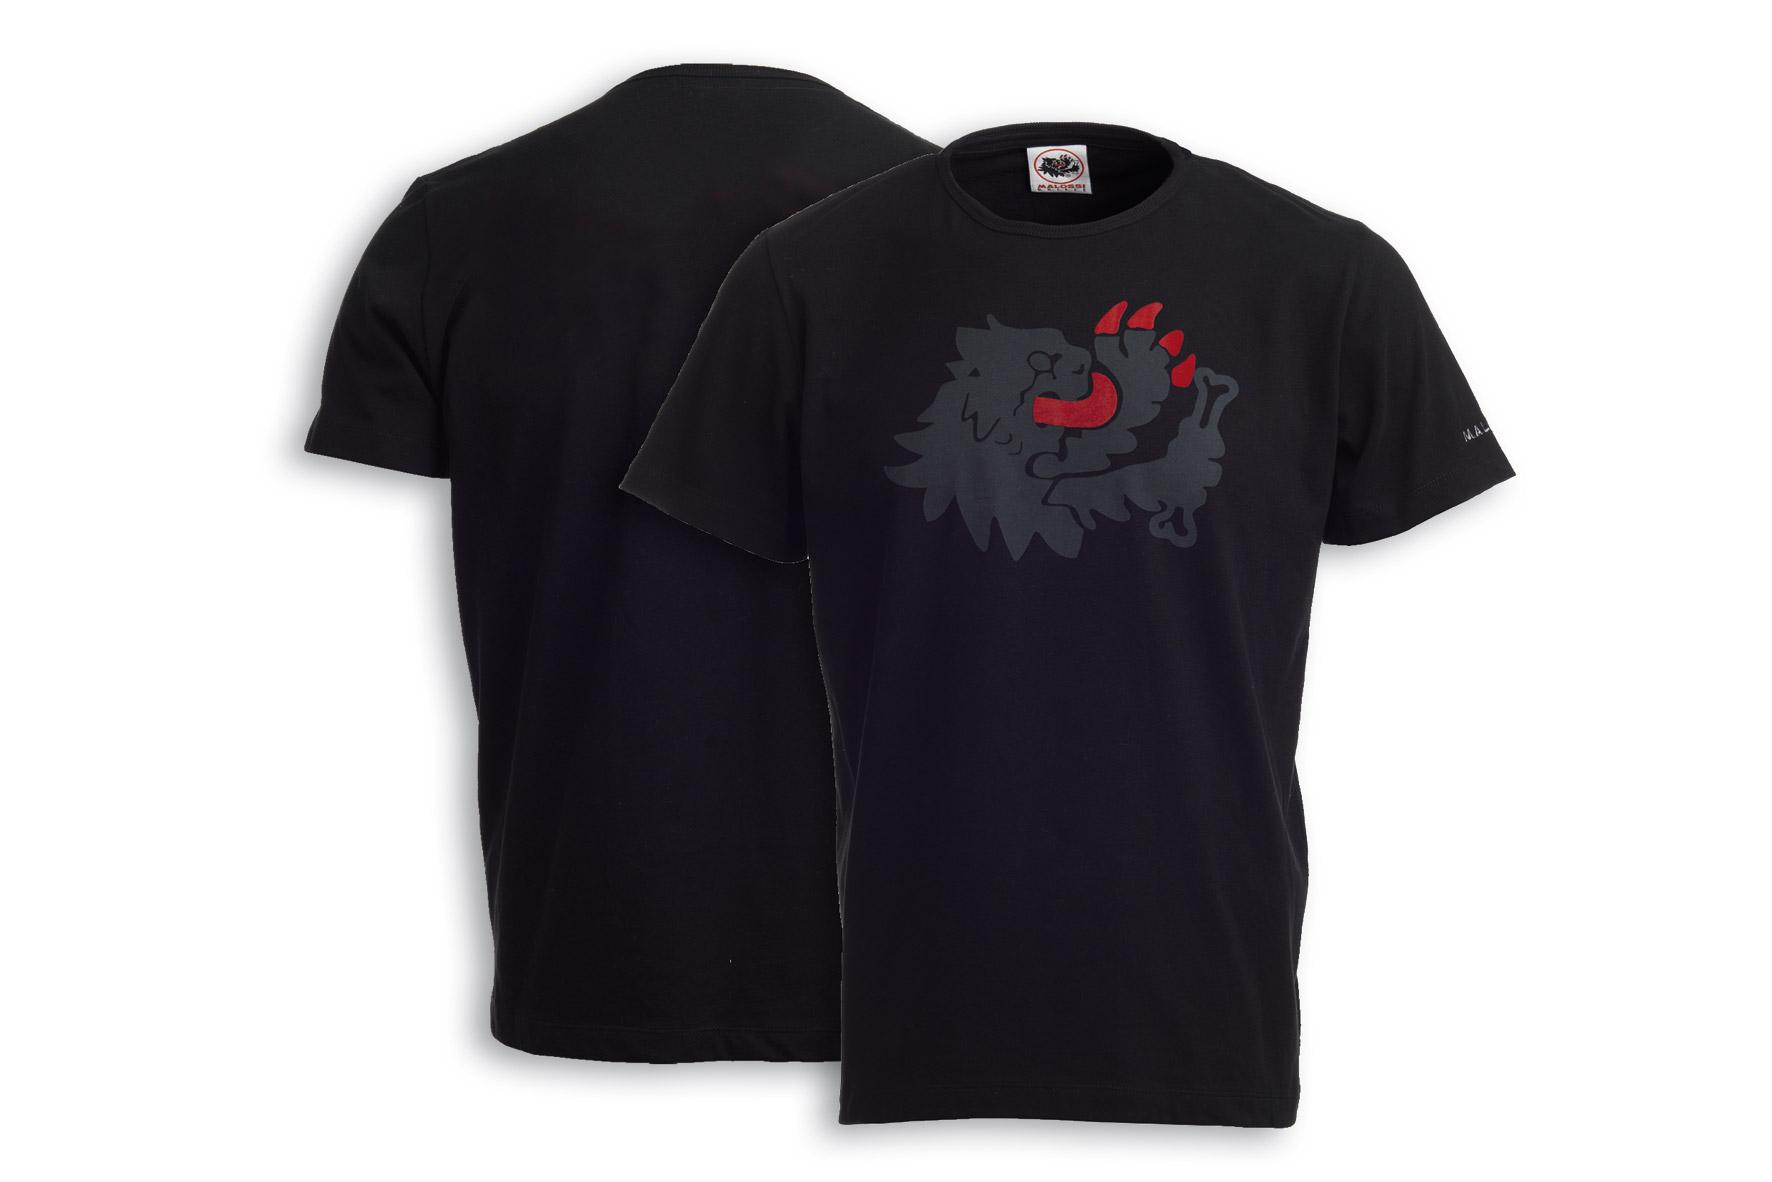 BLACK T-SHIRT MALOSSI griffe - LION ( M )